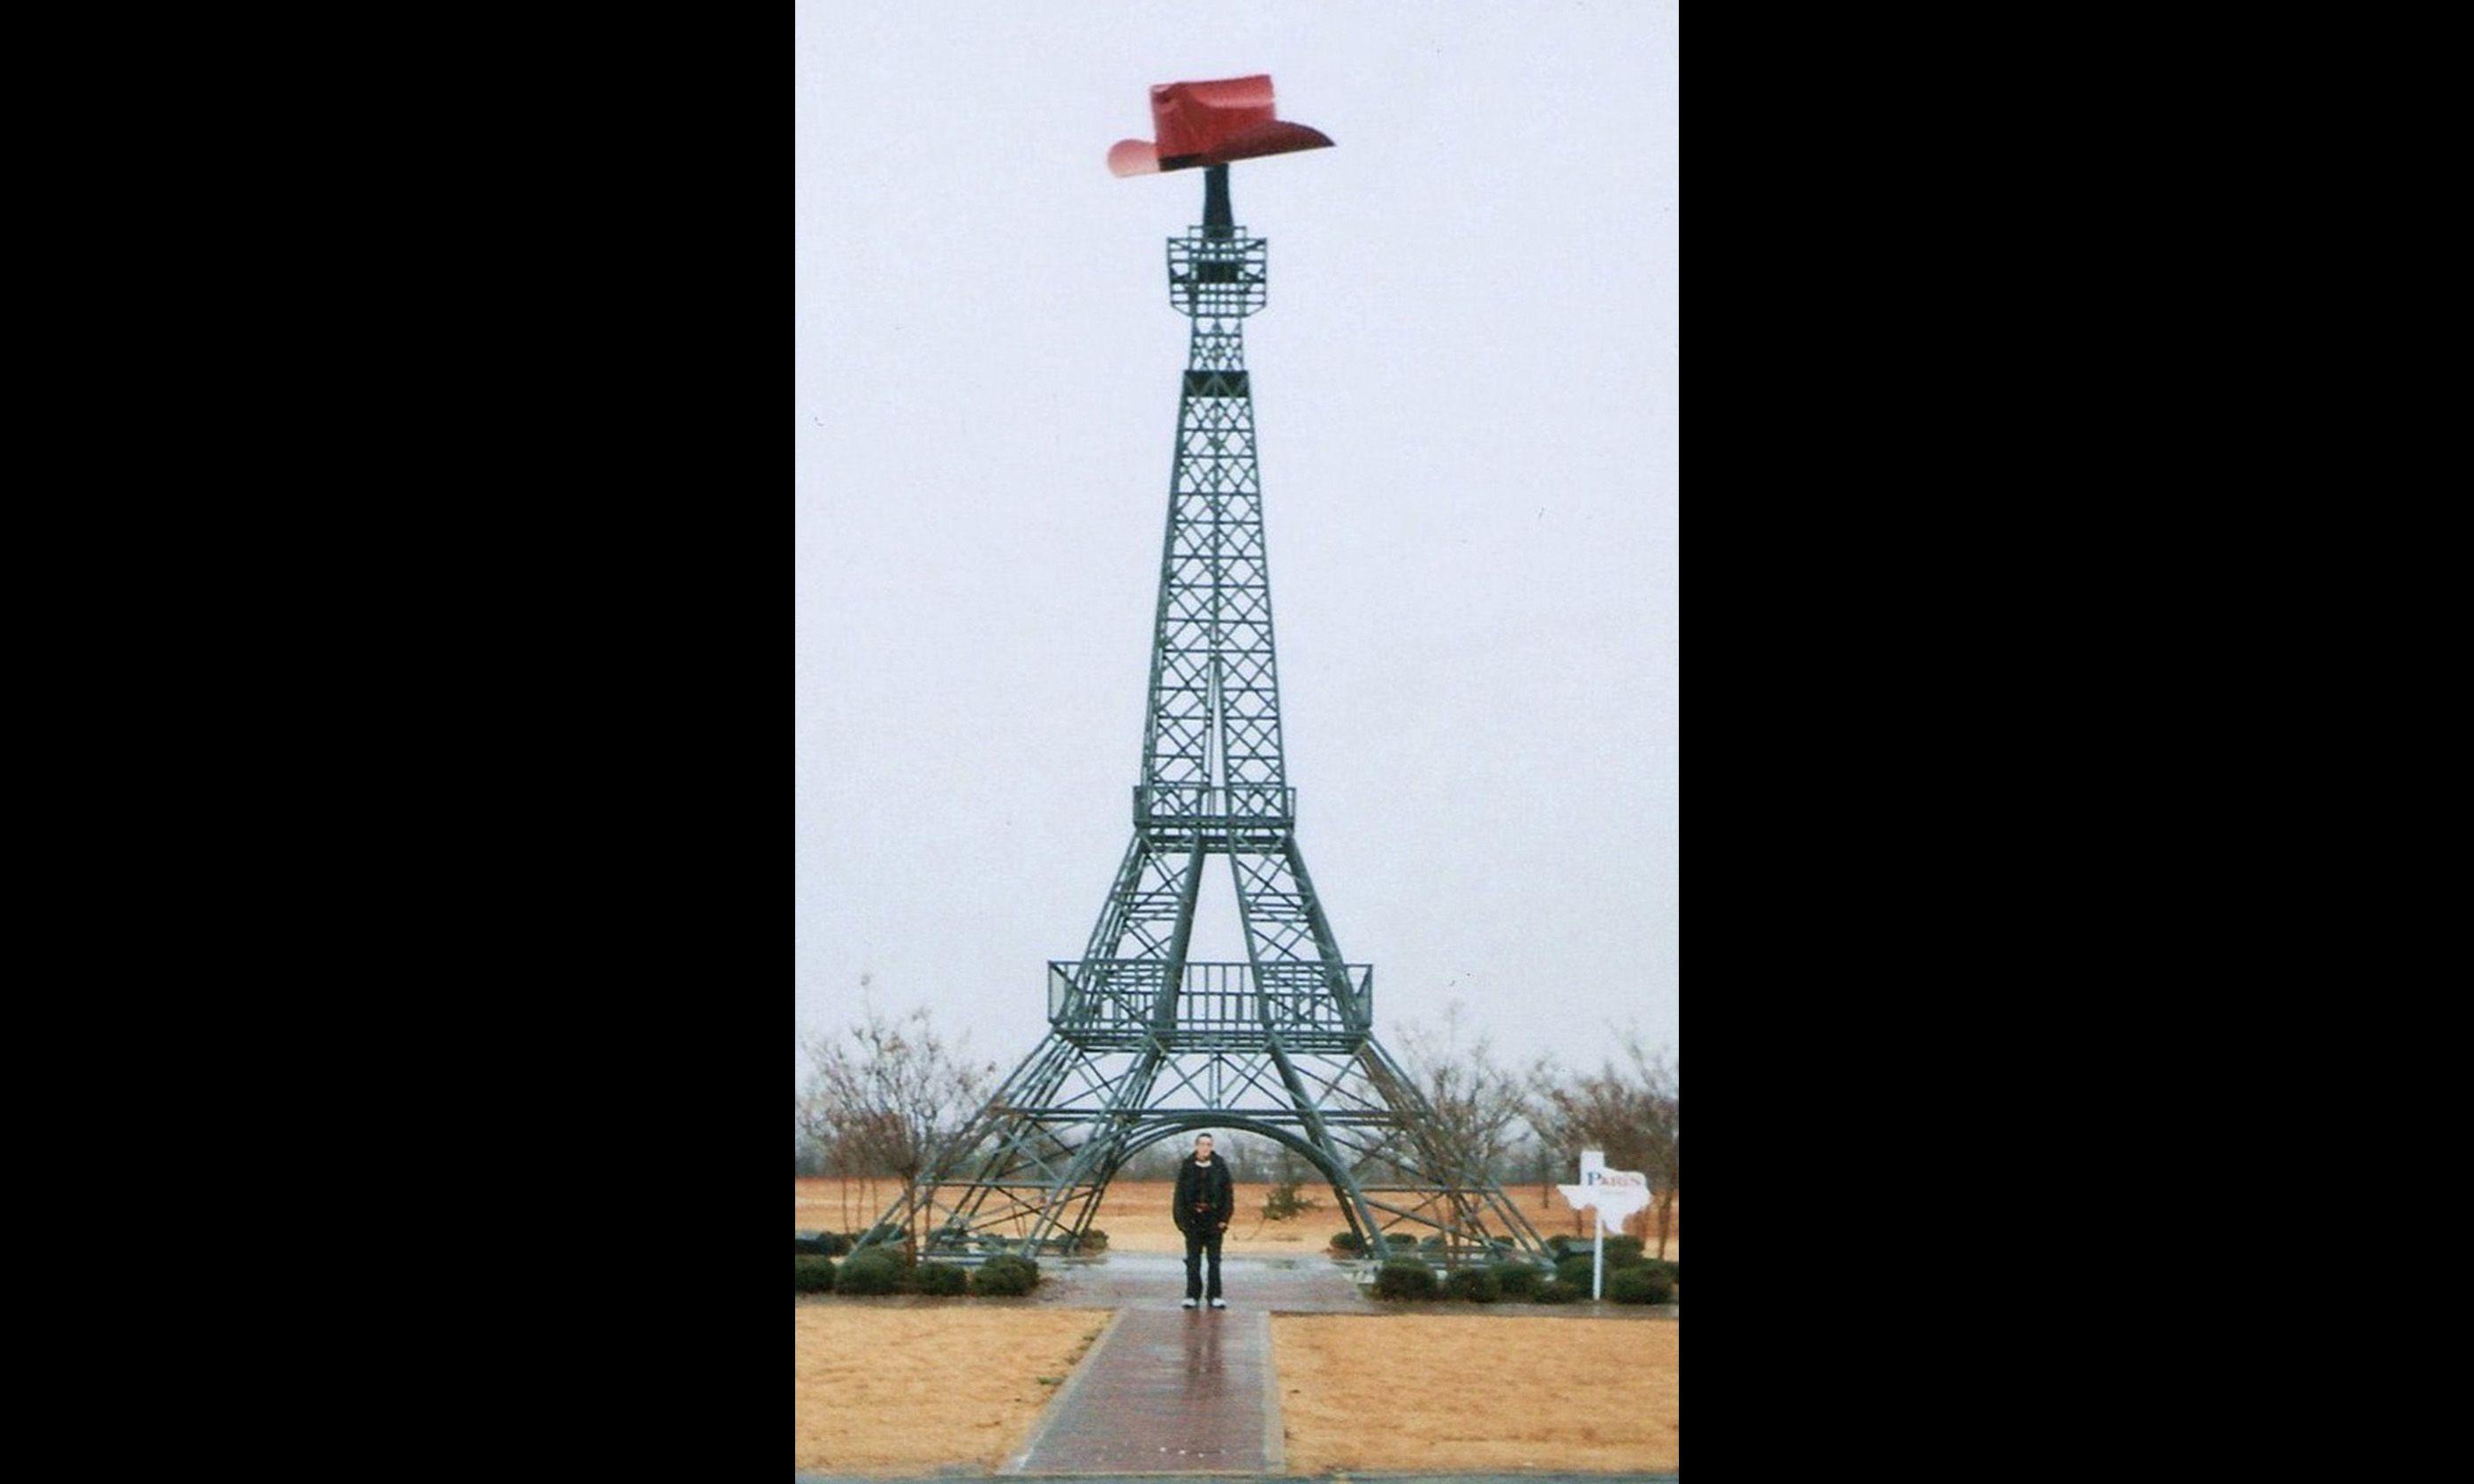 Paris, Texas (Jeanne Boleyn: Creative Commons Screen Capture 4/2/15)